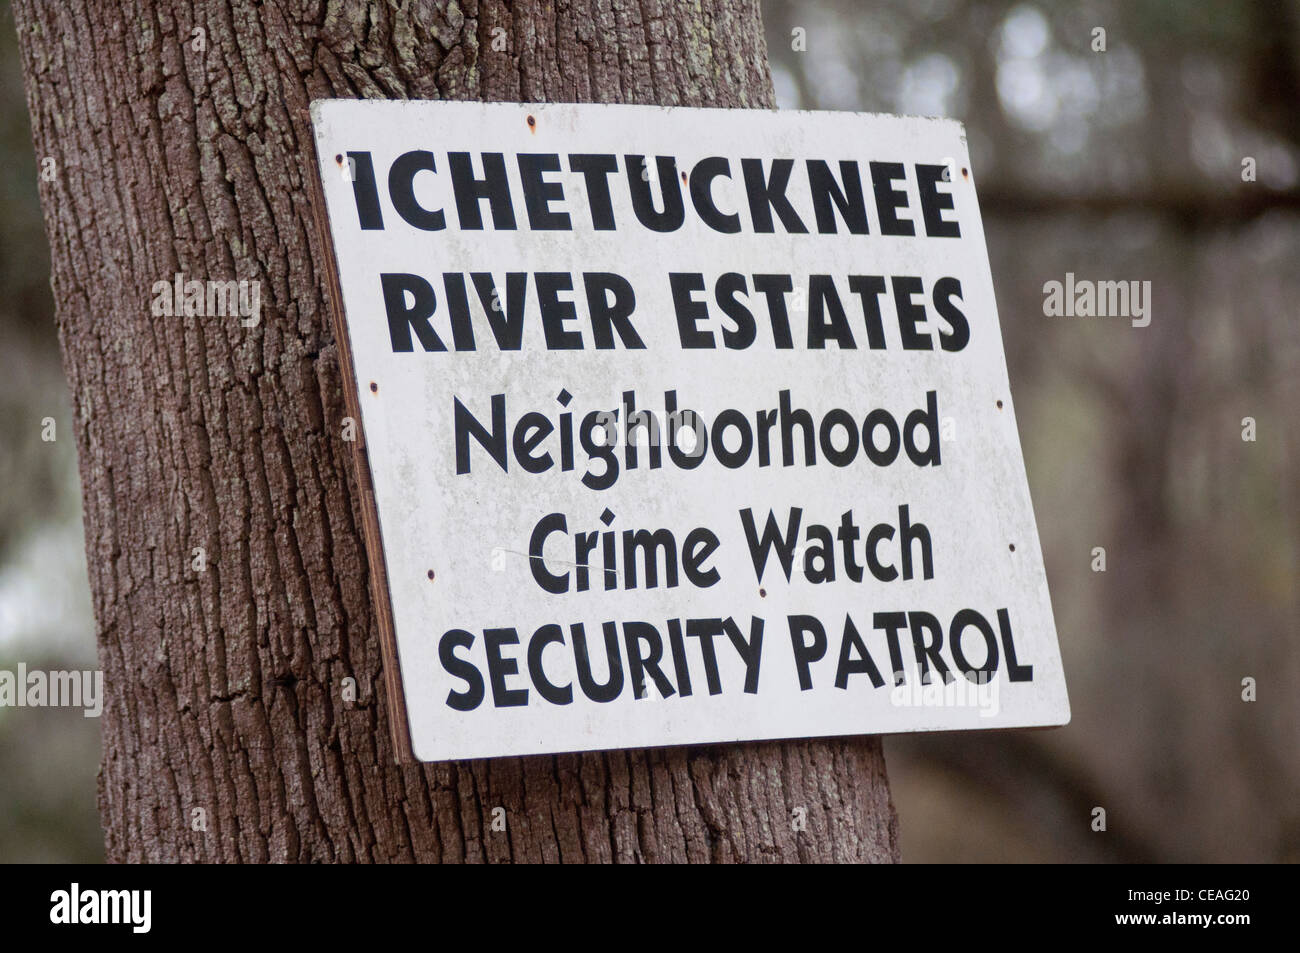 Ichetucknee river estates Neighborhood Watch criminalità sicurezza segno Patrol, Florida, Stati Uniti, STATI Immagini Stock